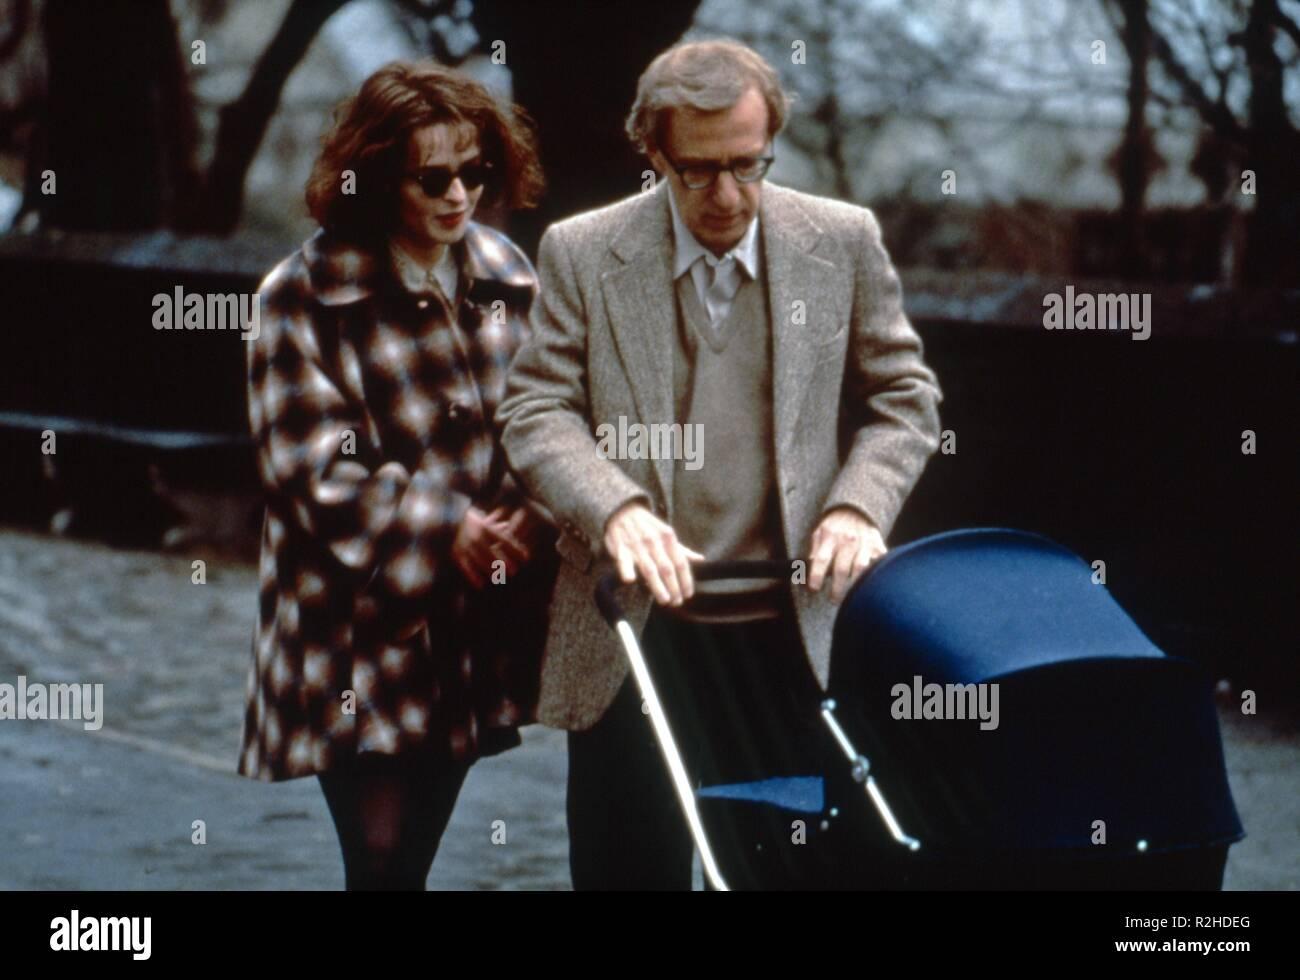 Mighty Aphrodite  Year : 1995  USA Director : Woody Allen Helena Bonham-Carter, Woody Allen - Stock Image